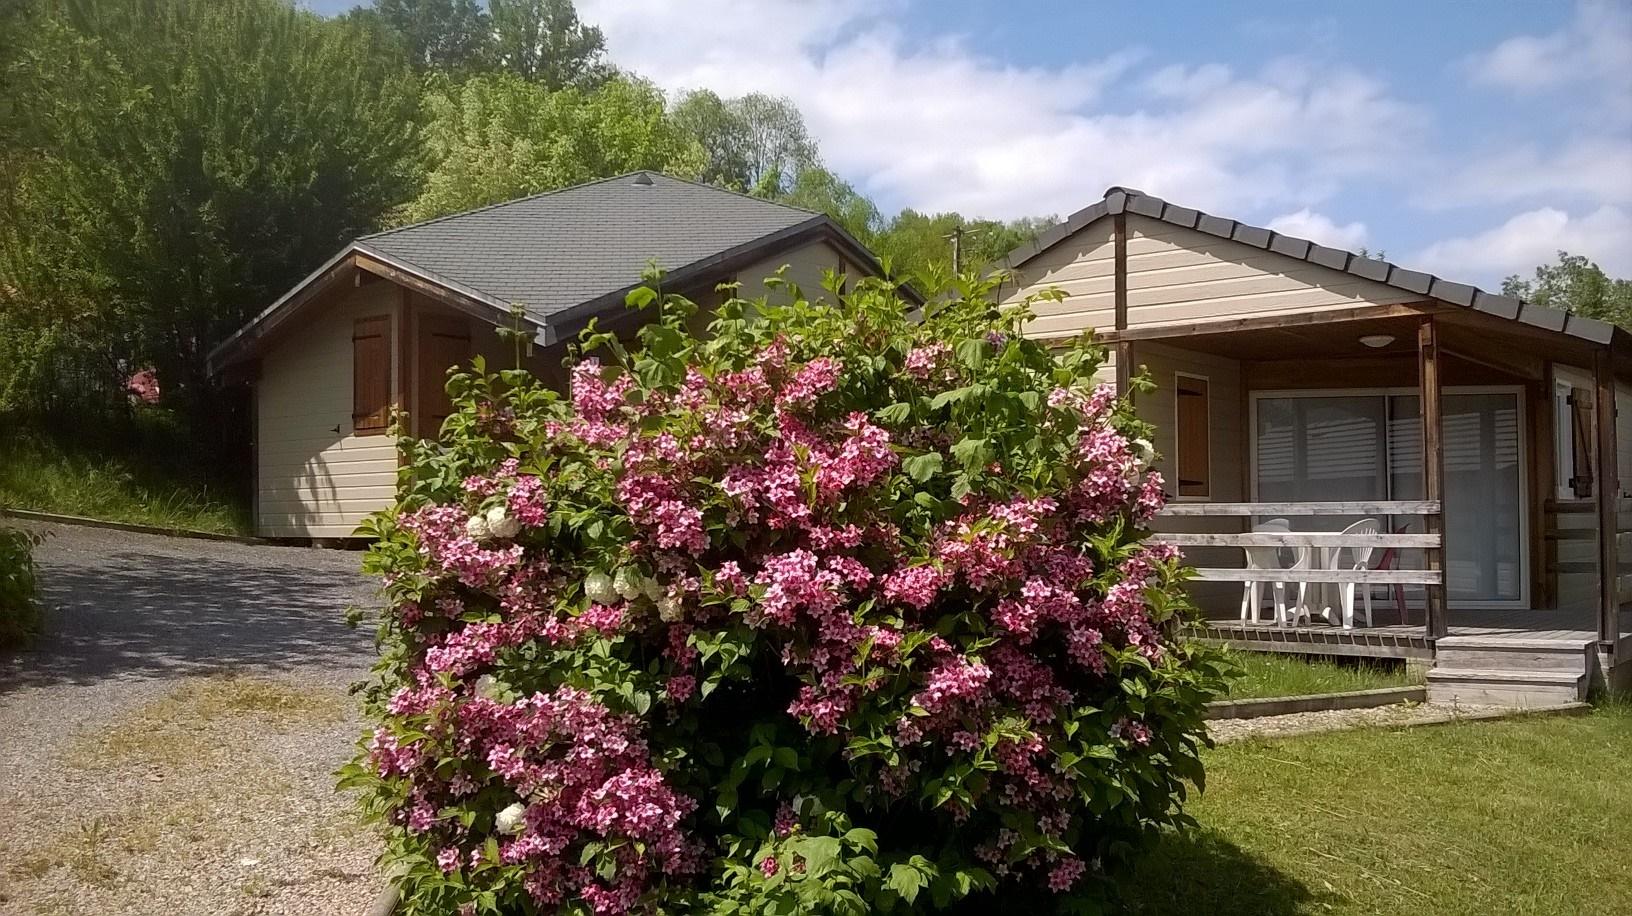 Notre village de vacances fleuri